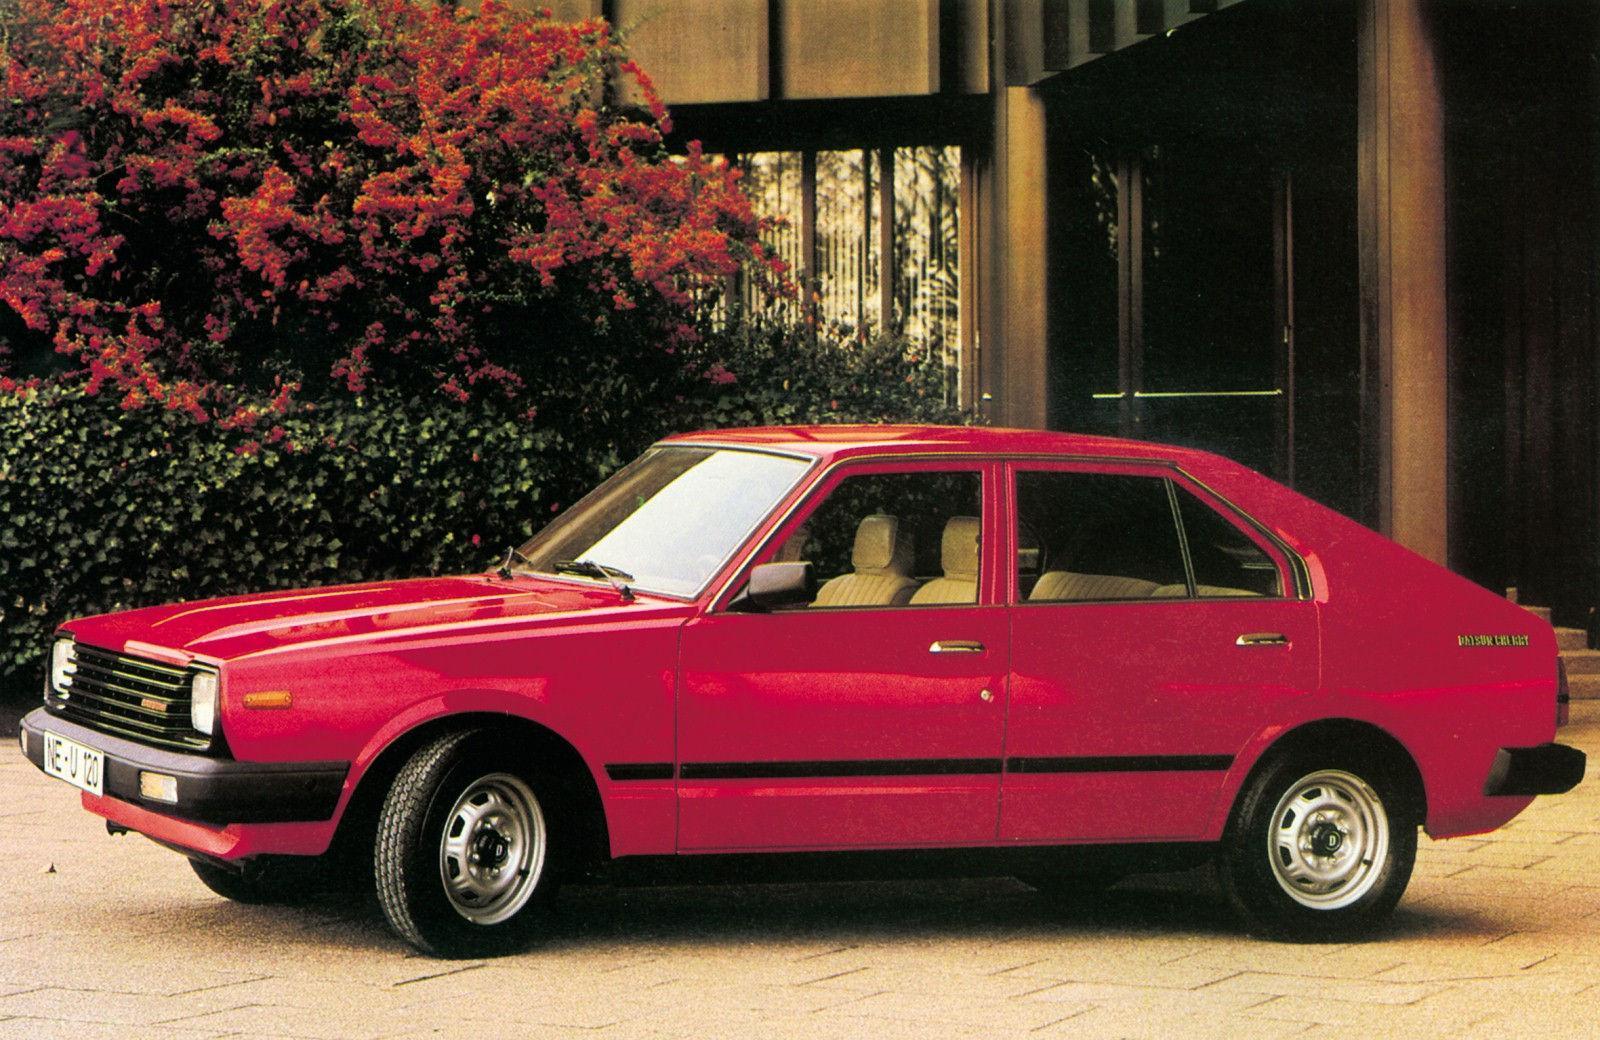 Nissan Datsun Cherry 5-türig (1981)